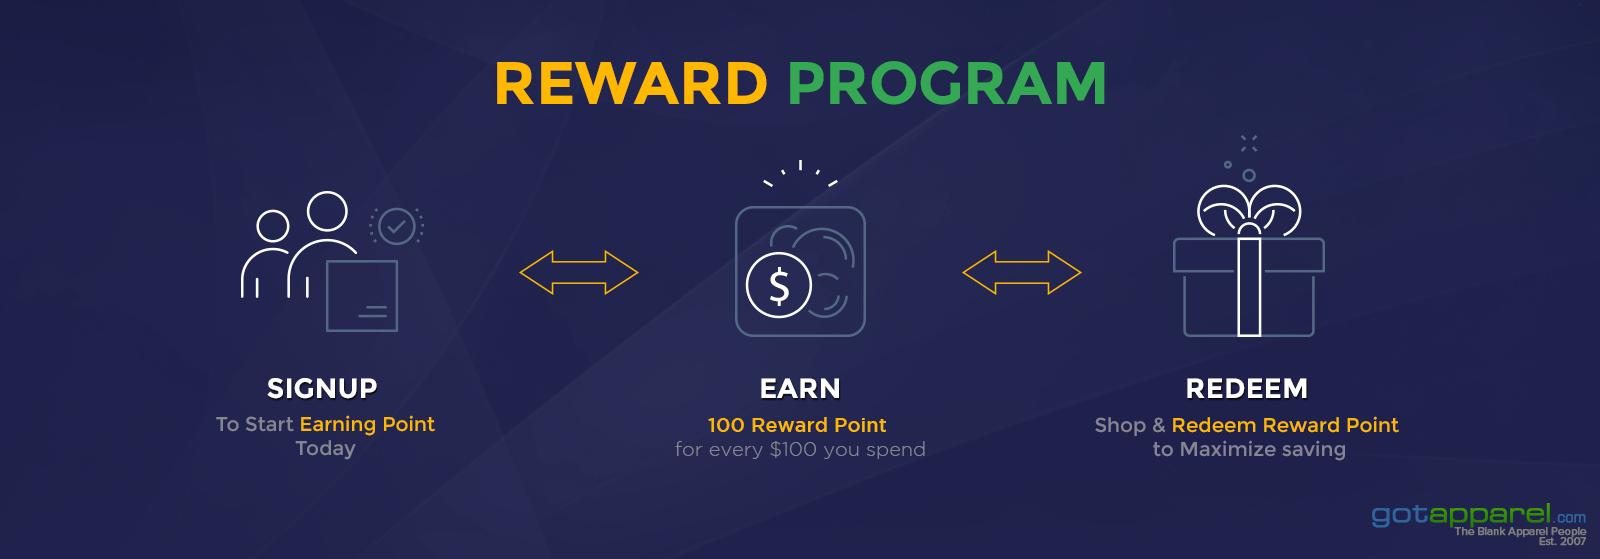 reward-program.png